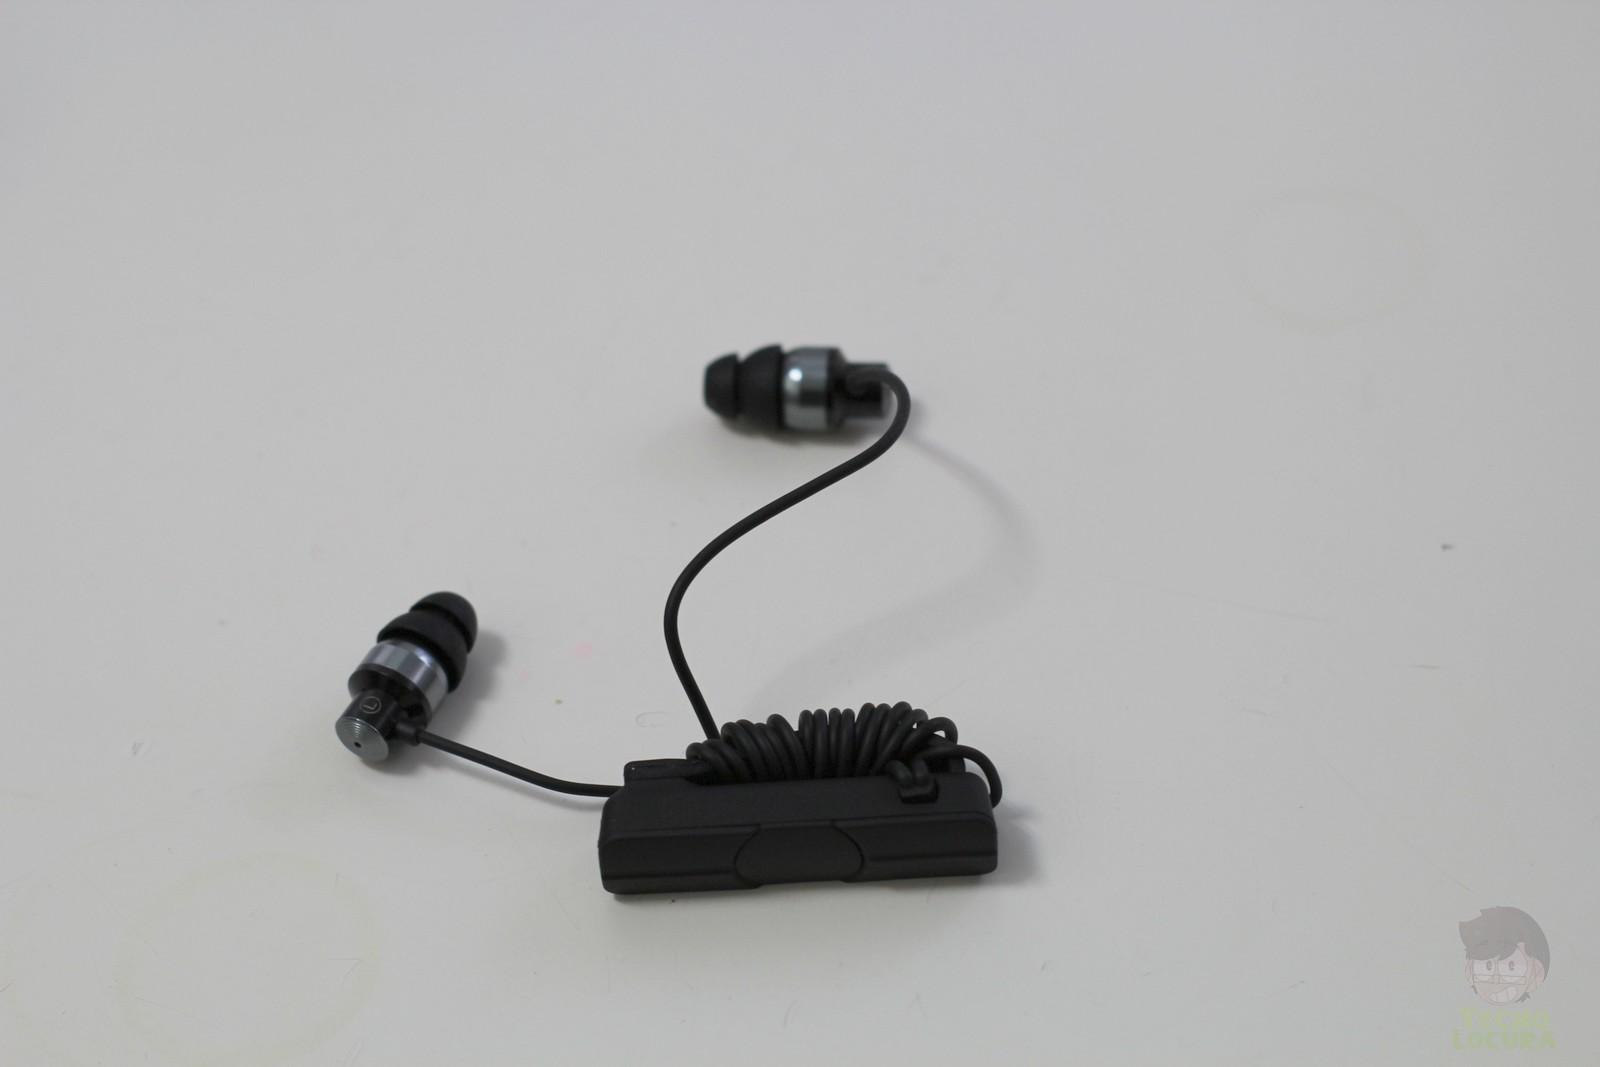 Impulse Wireless